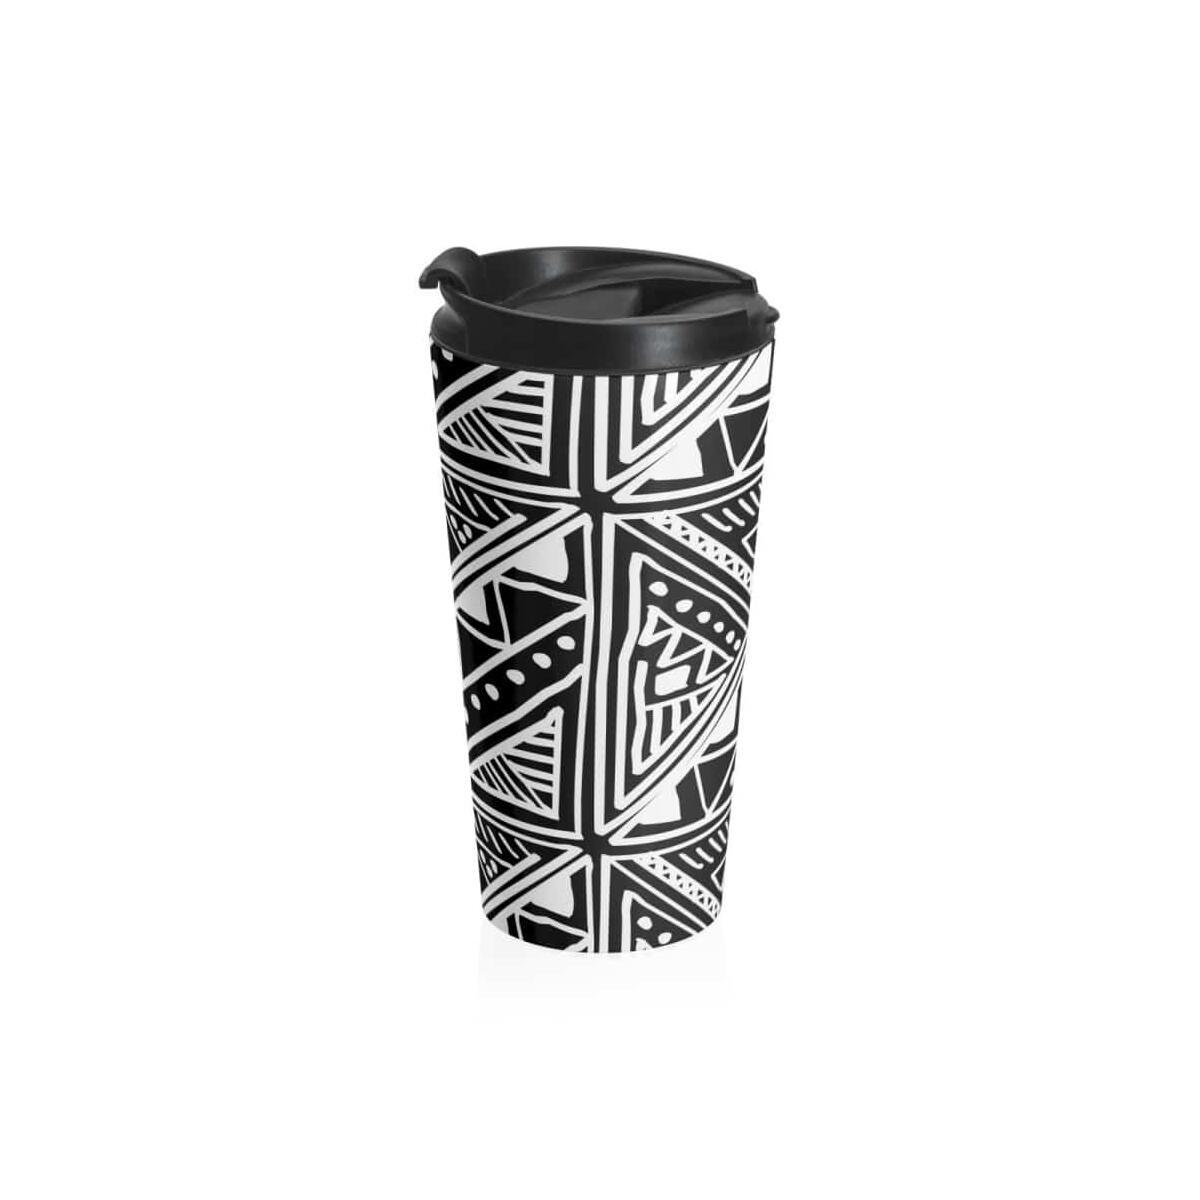 White Mud-cloth Stainless Steel Travel Mug